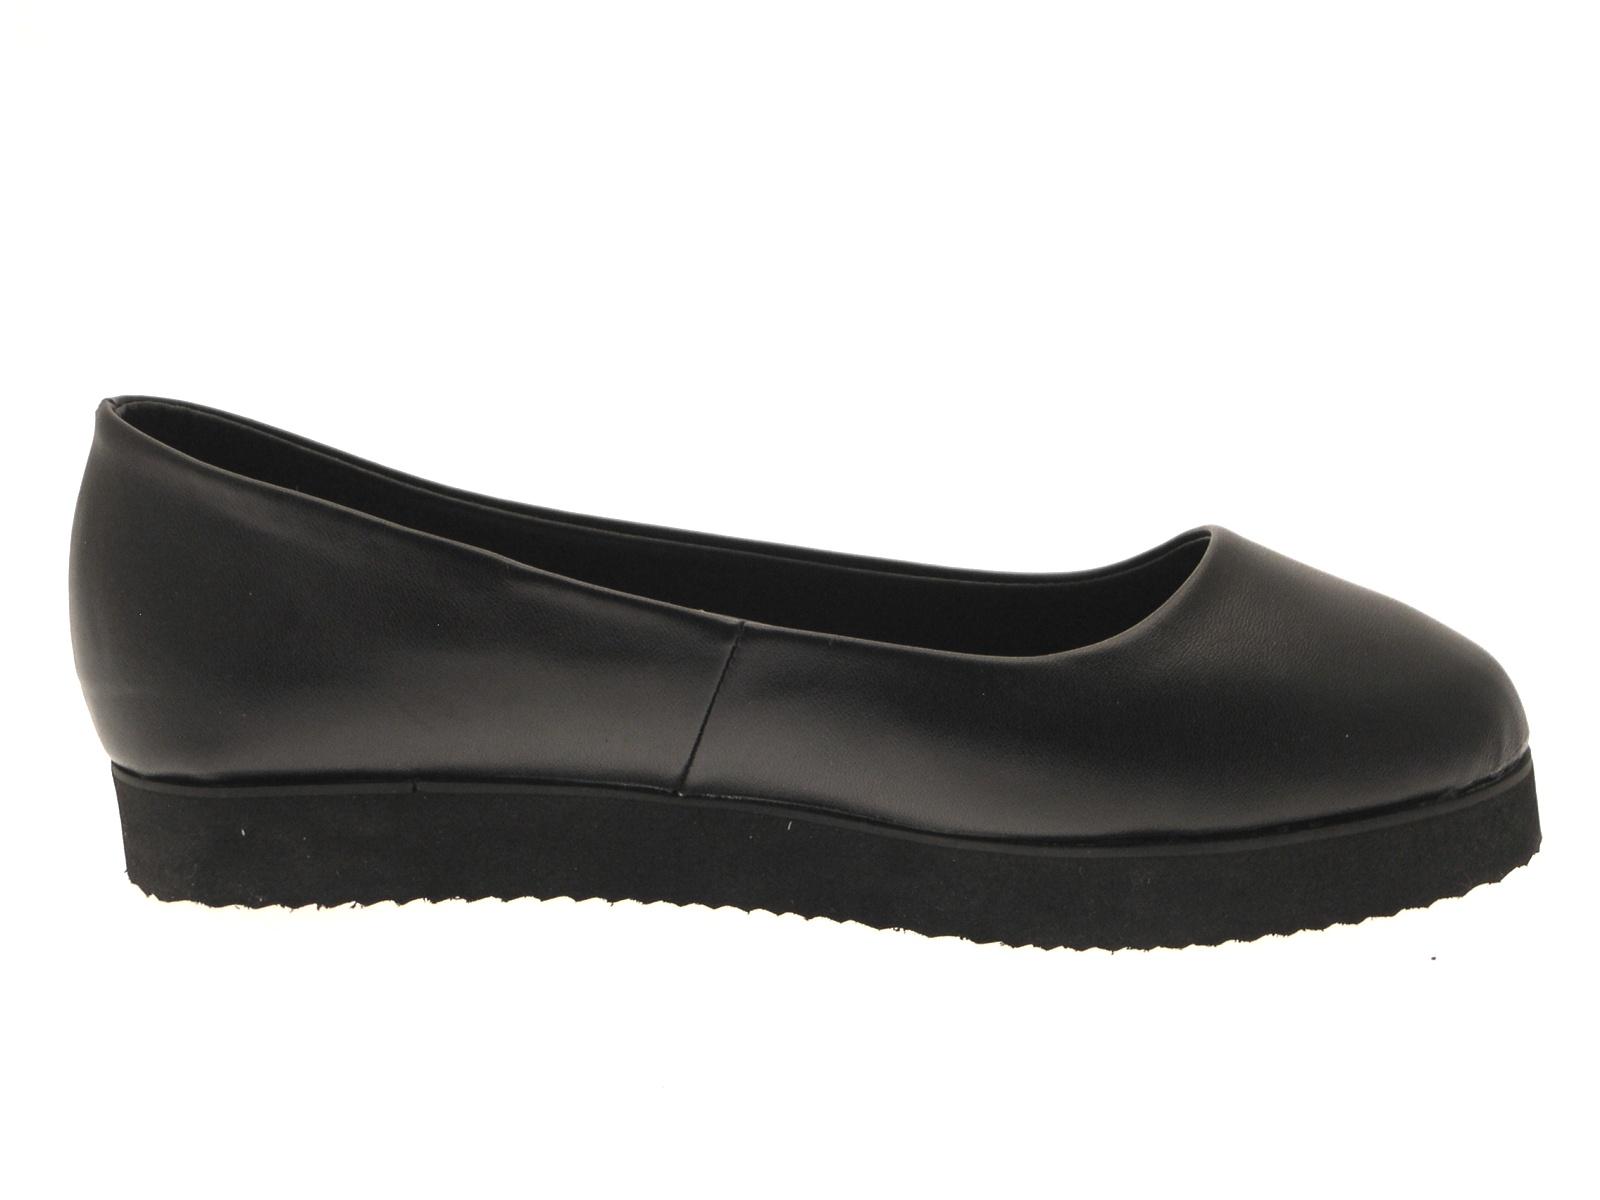 black plain slip on faux leather school womens